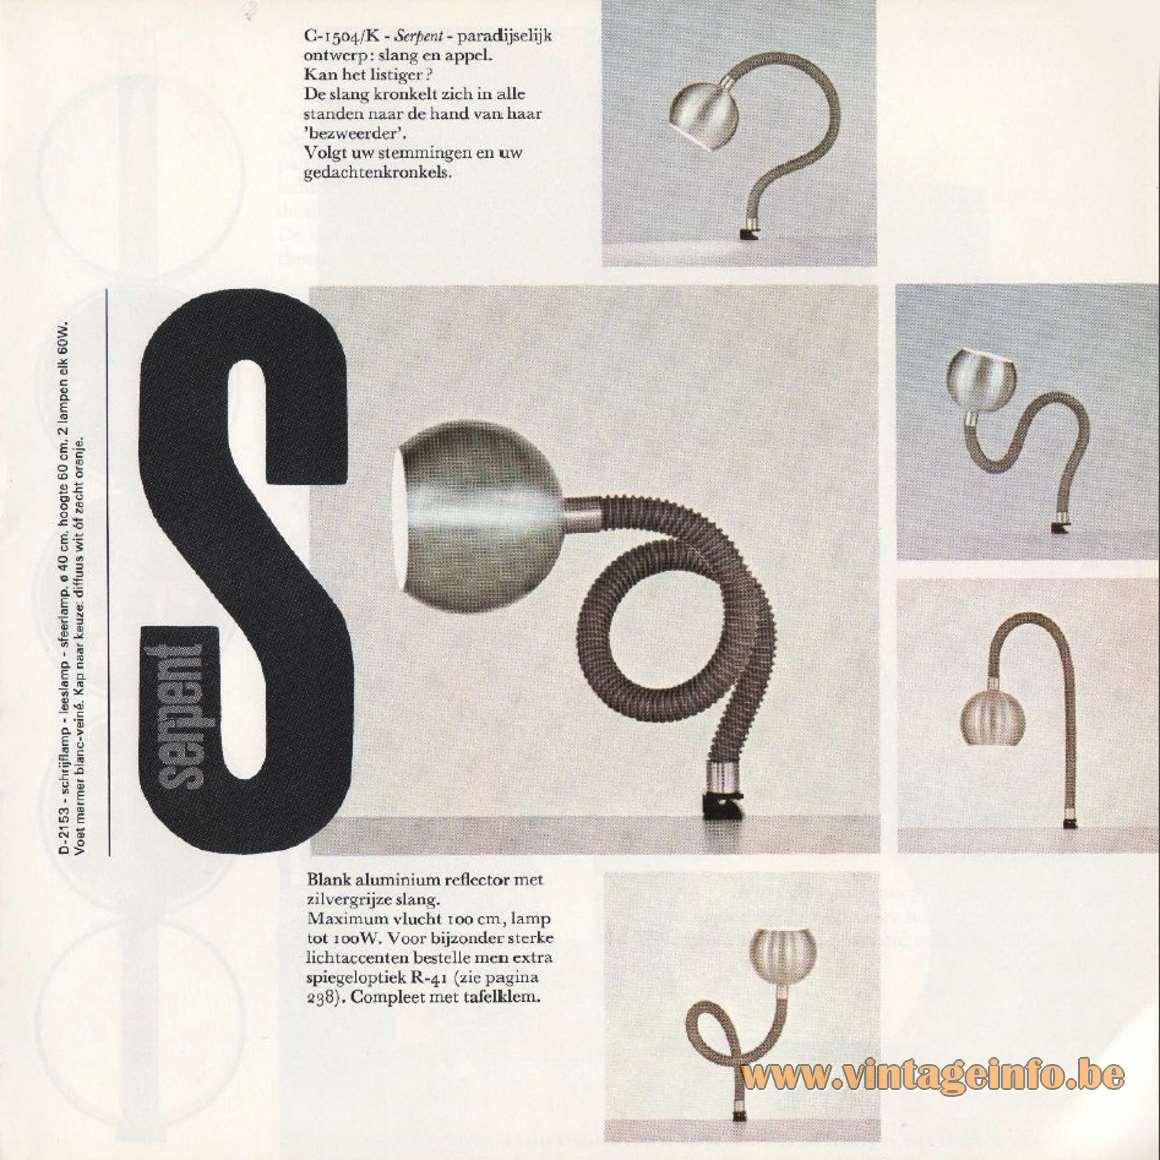 Raak Serpent Table or Desk Clamp Lamp Catalague 8 - 1968